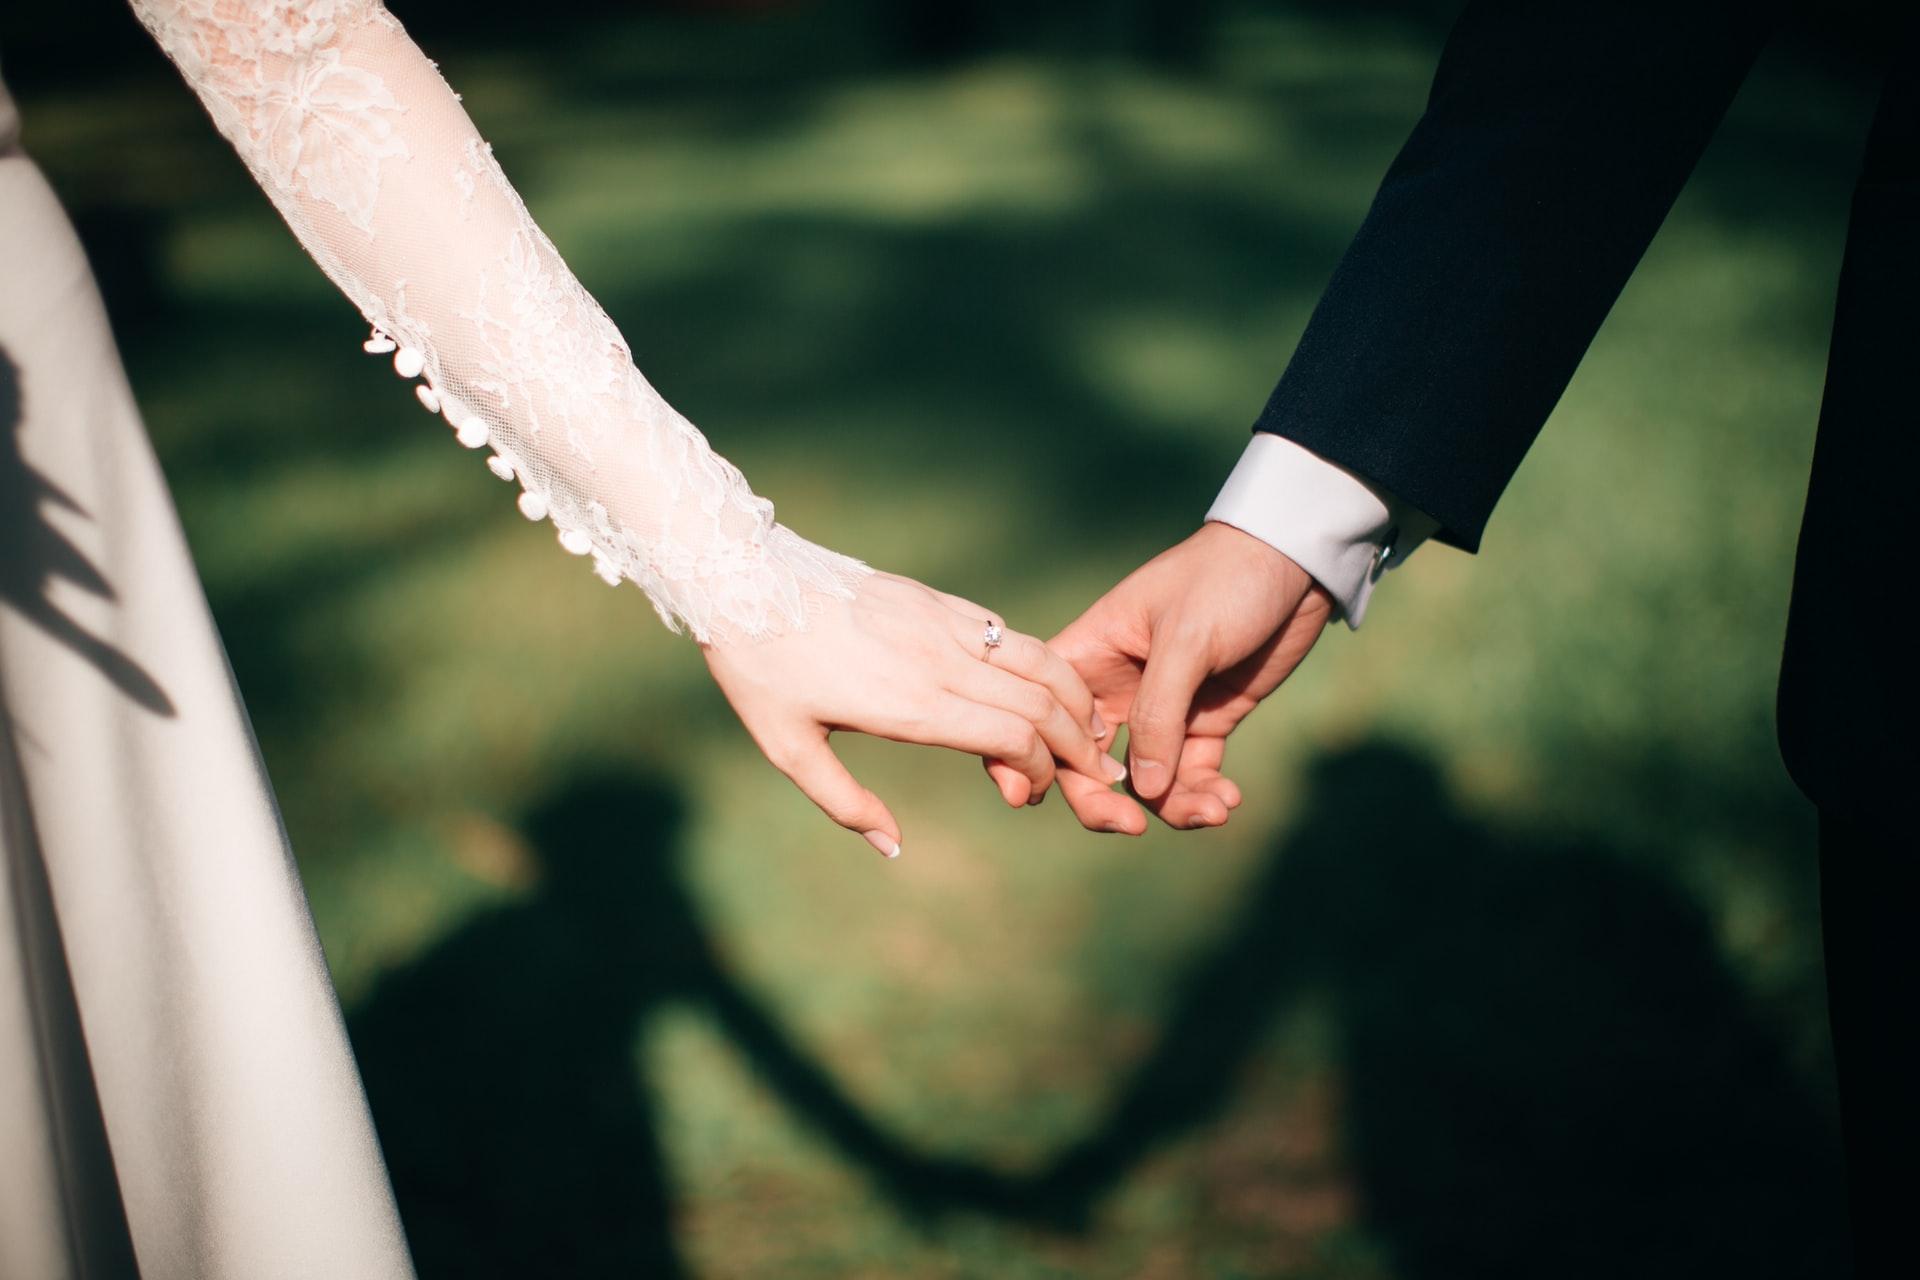 jeremy-wong-weddings-464ps-noflw-unsplash.jpg